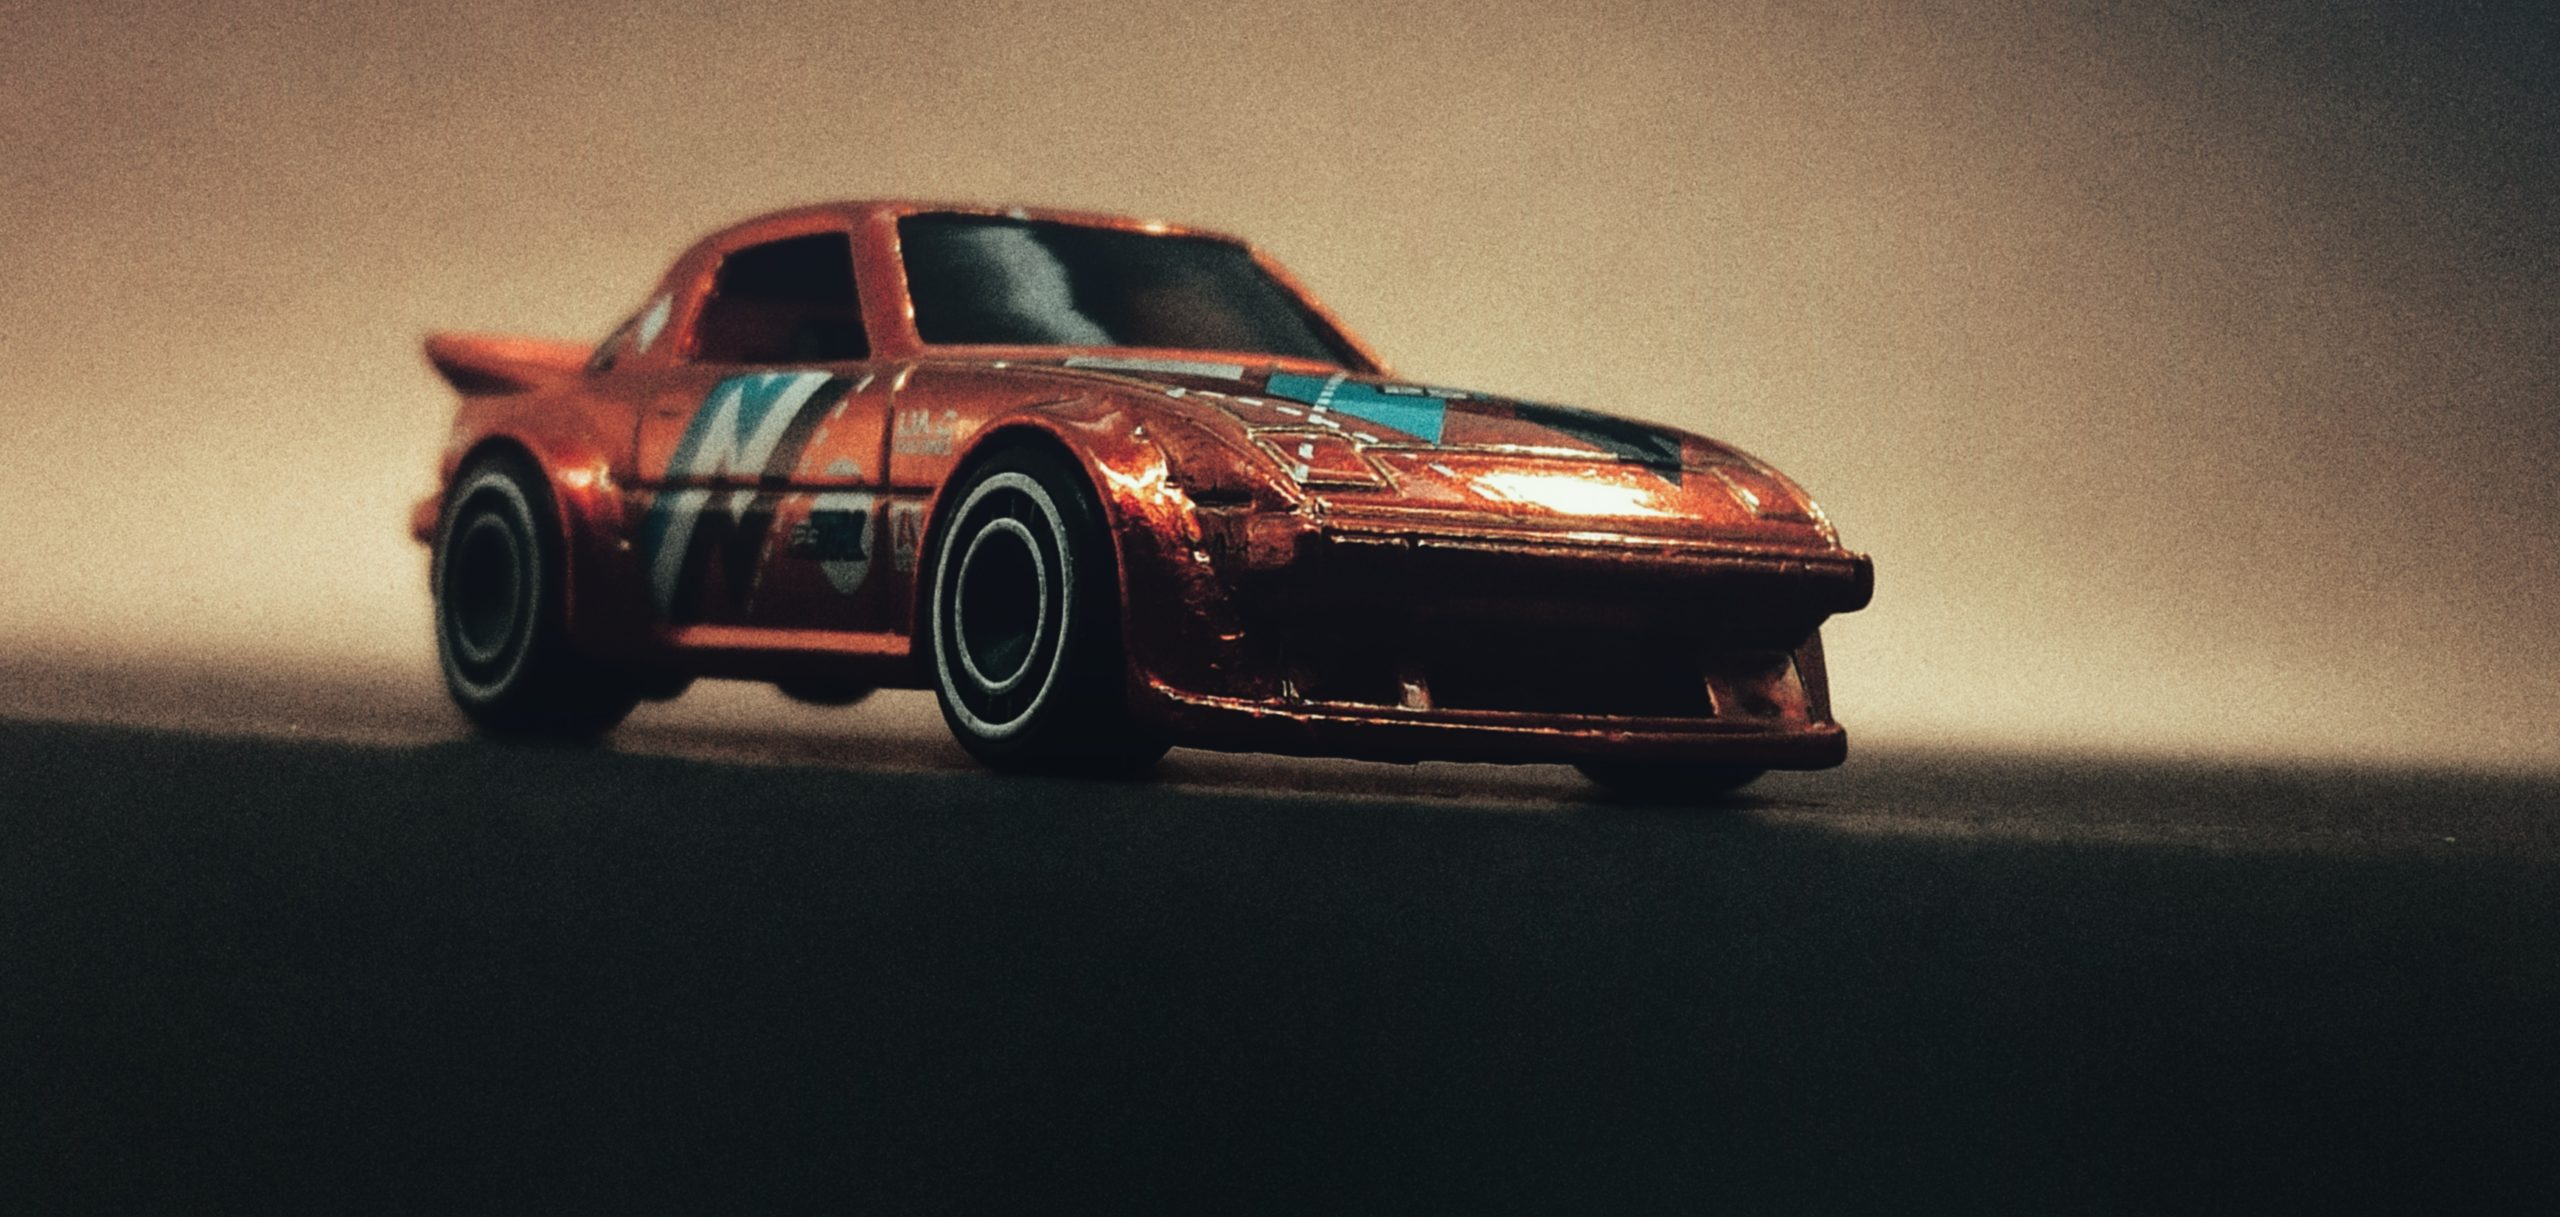 Hot Wheels Mazda RX-7 (GHG28) 2020 (130/250) Speed Blur (5/5) spectraflame orange Super Treasure Hunt (STH) front angle